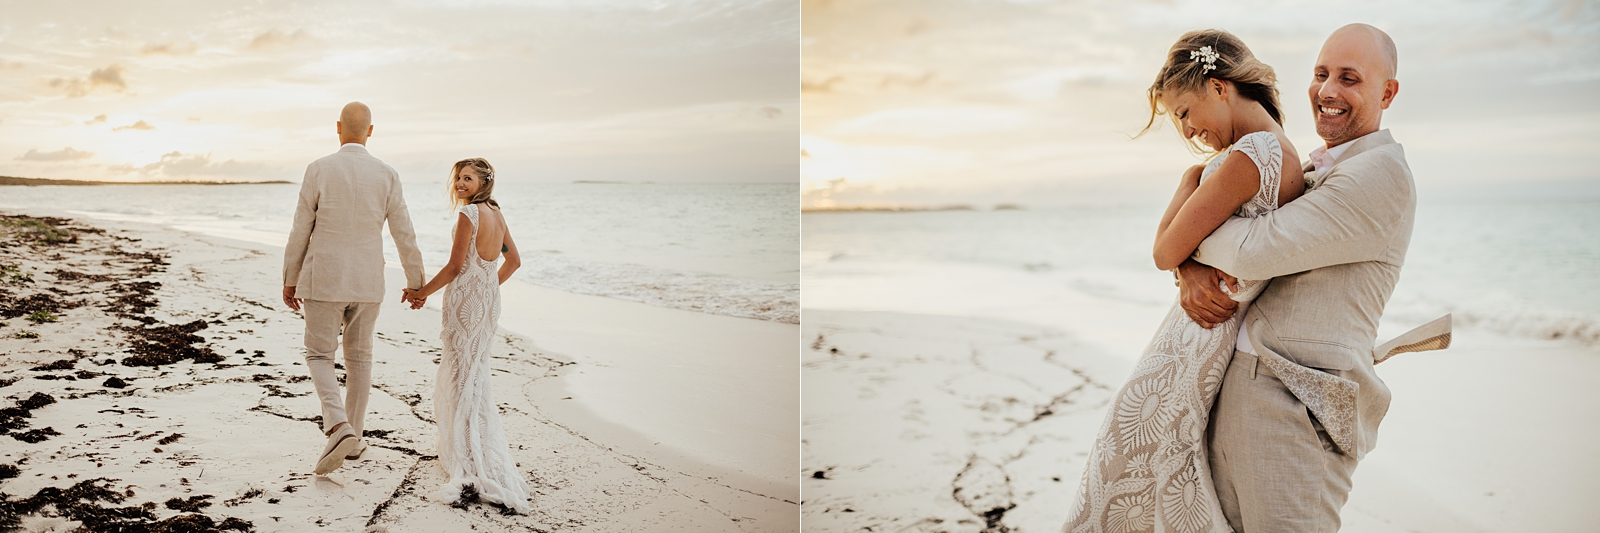 Jenni & Andrew Intimate Beach Destination Wedding in Little Exuma, Bahamas_0526.jpg